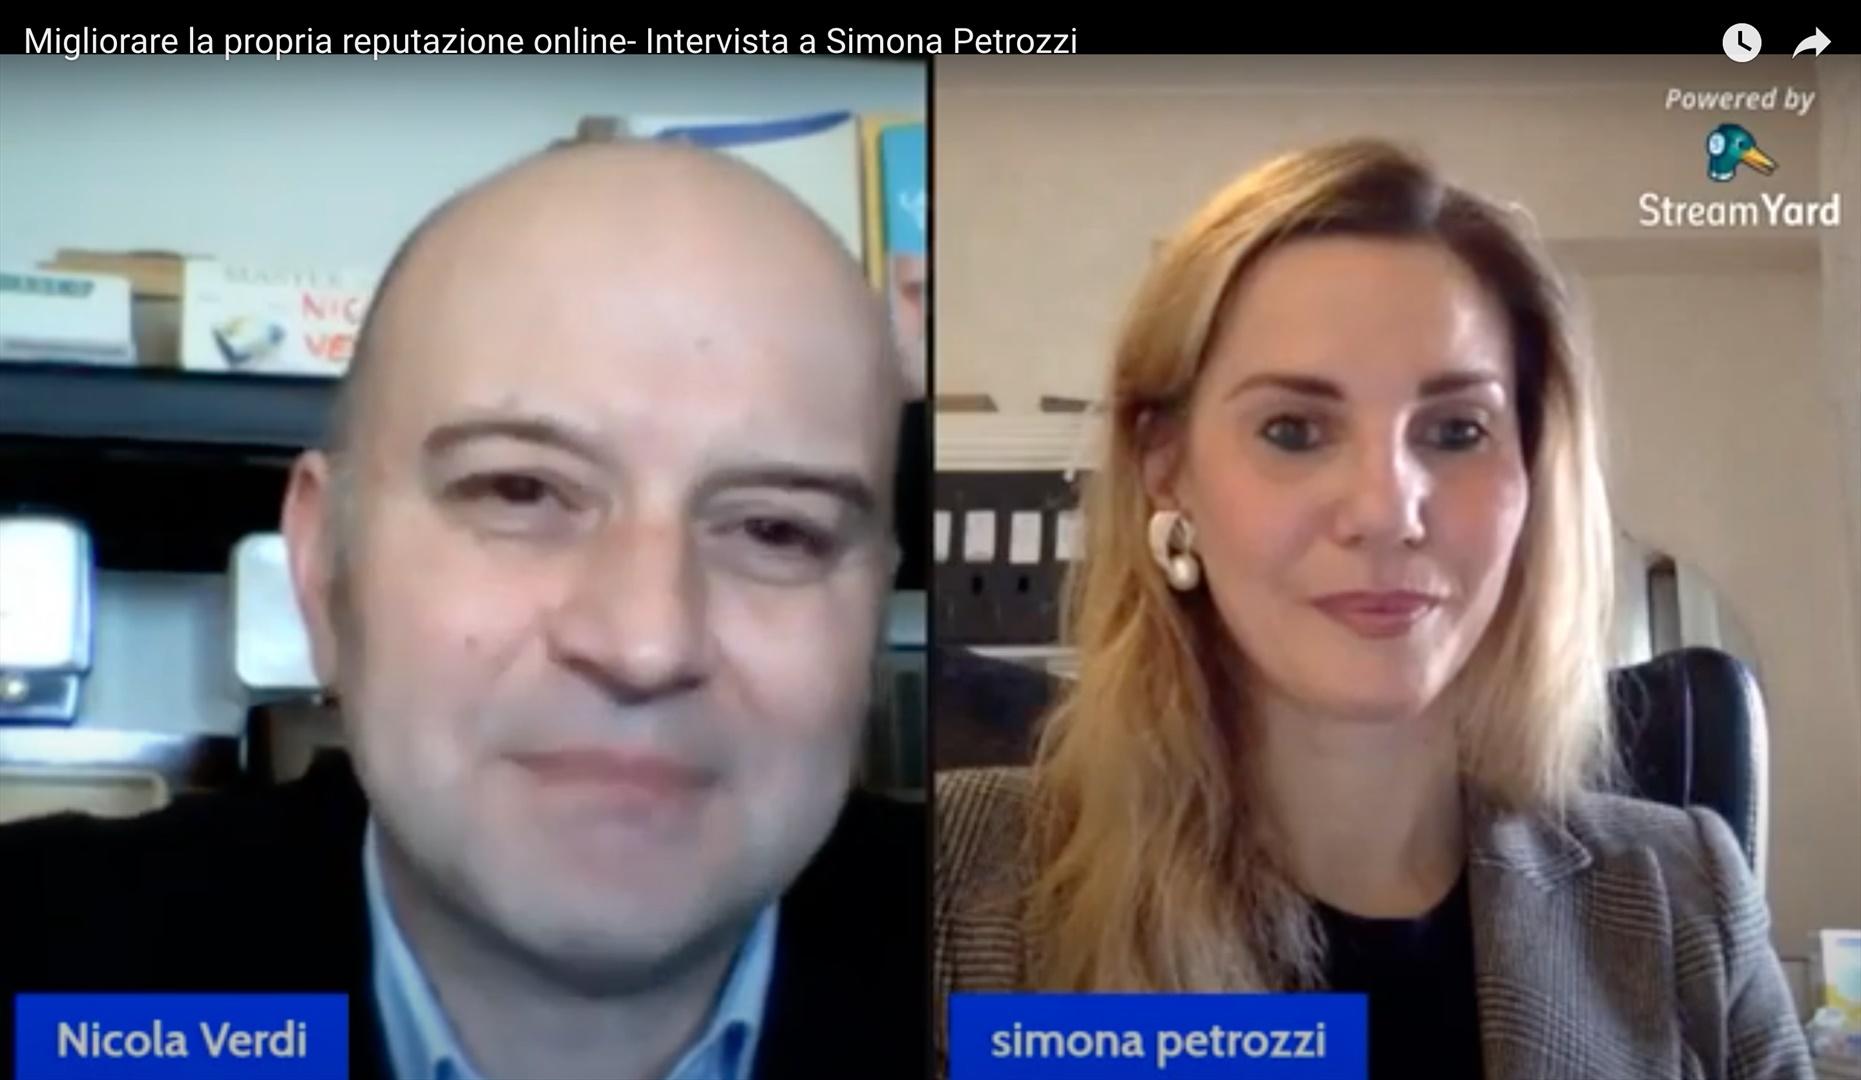 Simona Petrozzi intervistata da Nicola Verdi sulla Web Reputation